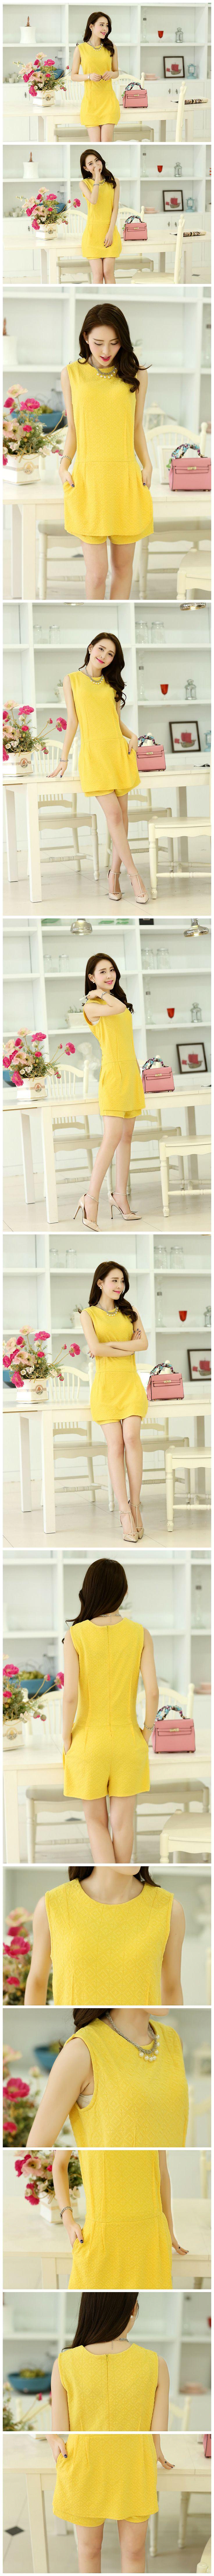 yellow shorts, jumpsuit playsuit  ghl0222, yrb, fashion, yrbfashion, cute dress, uk europe usa style, asian fashion, asian style clothing, a...